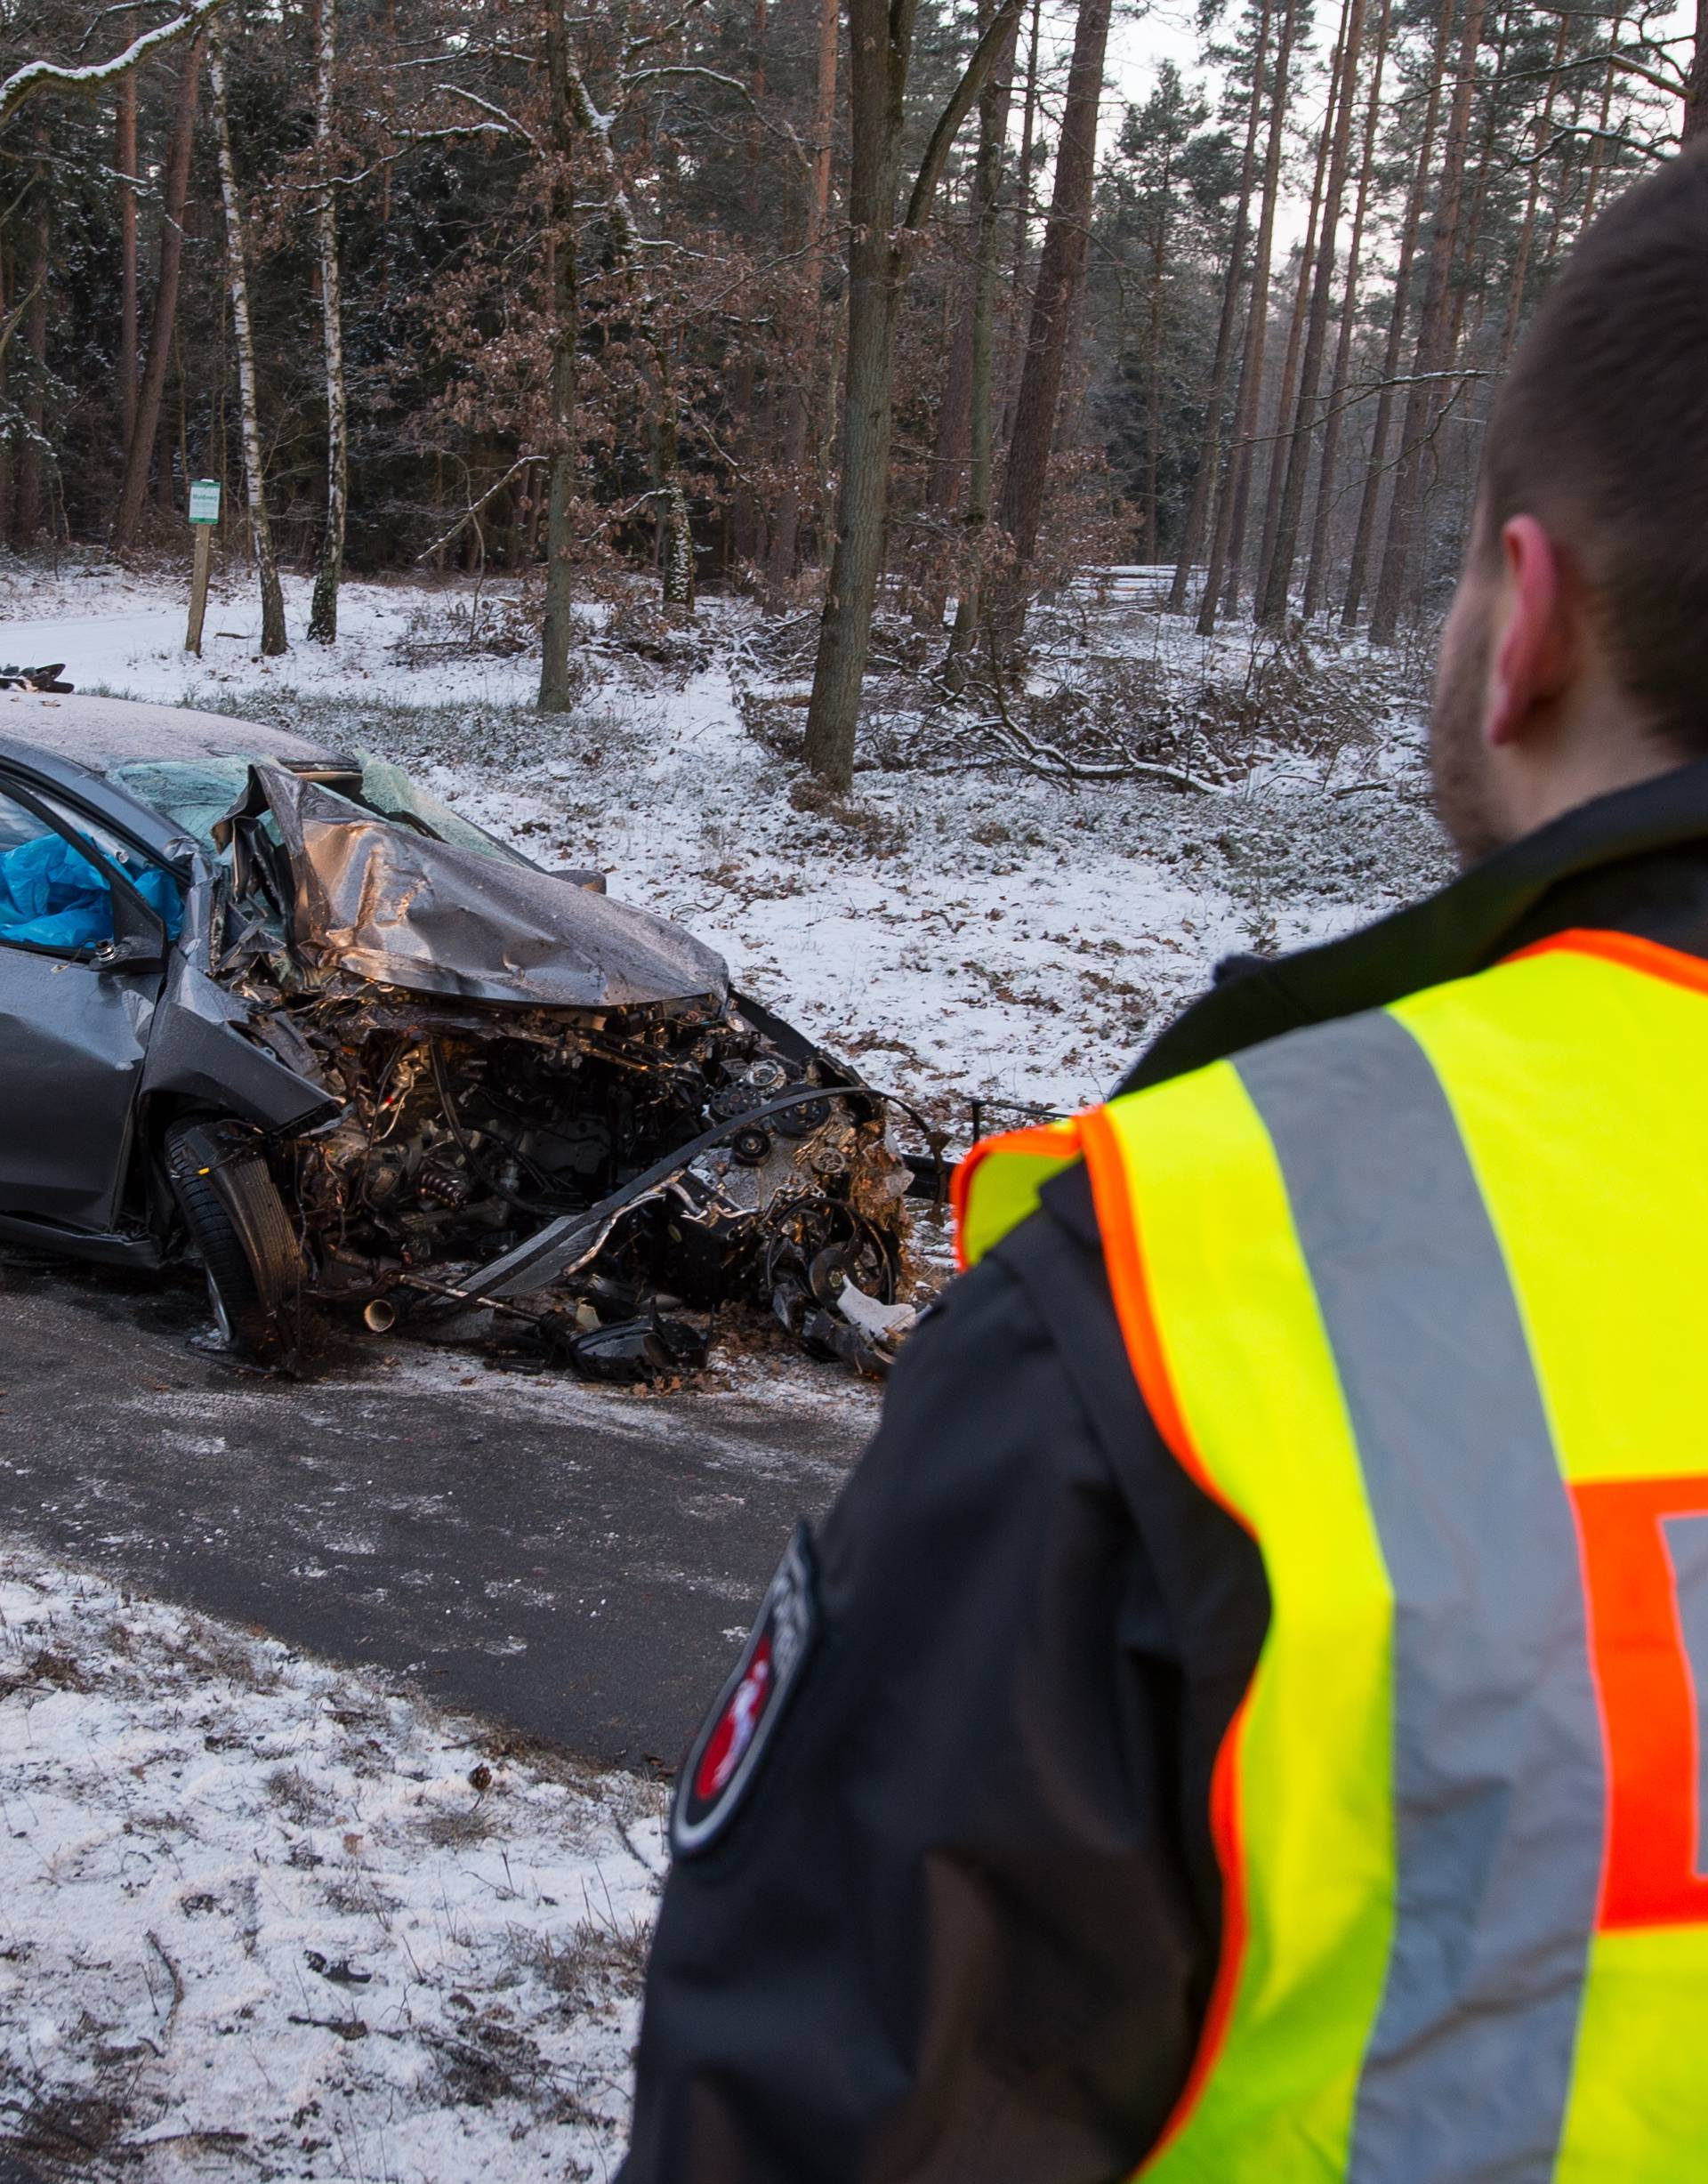 Traffic accident near Lueneburg